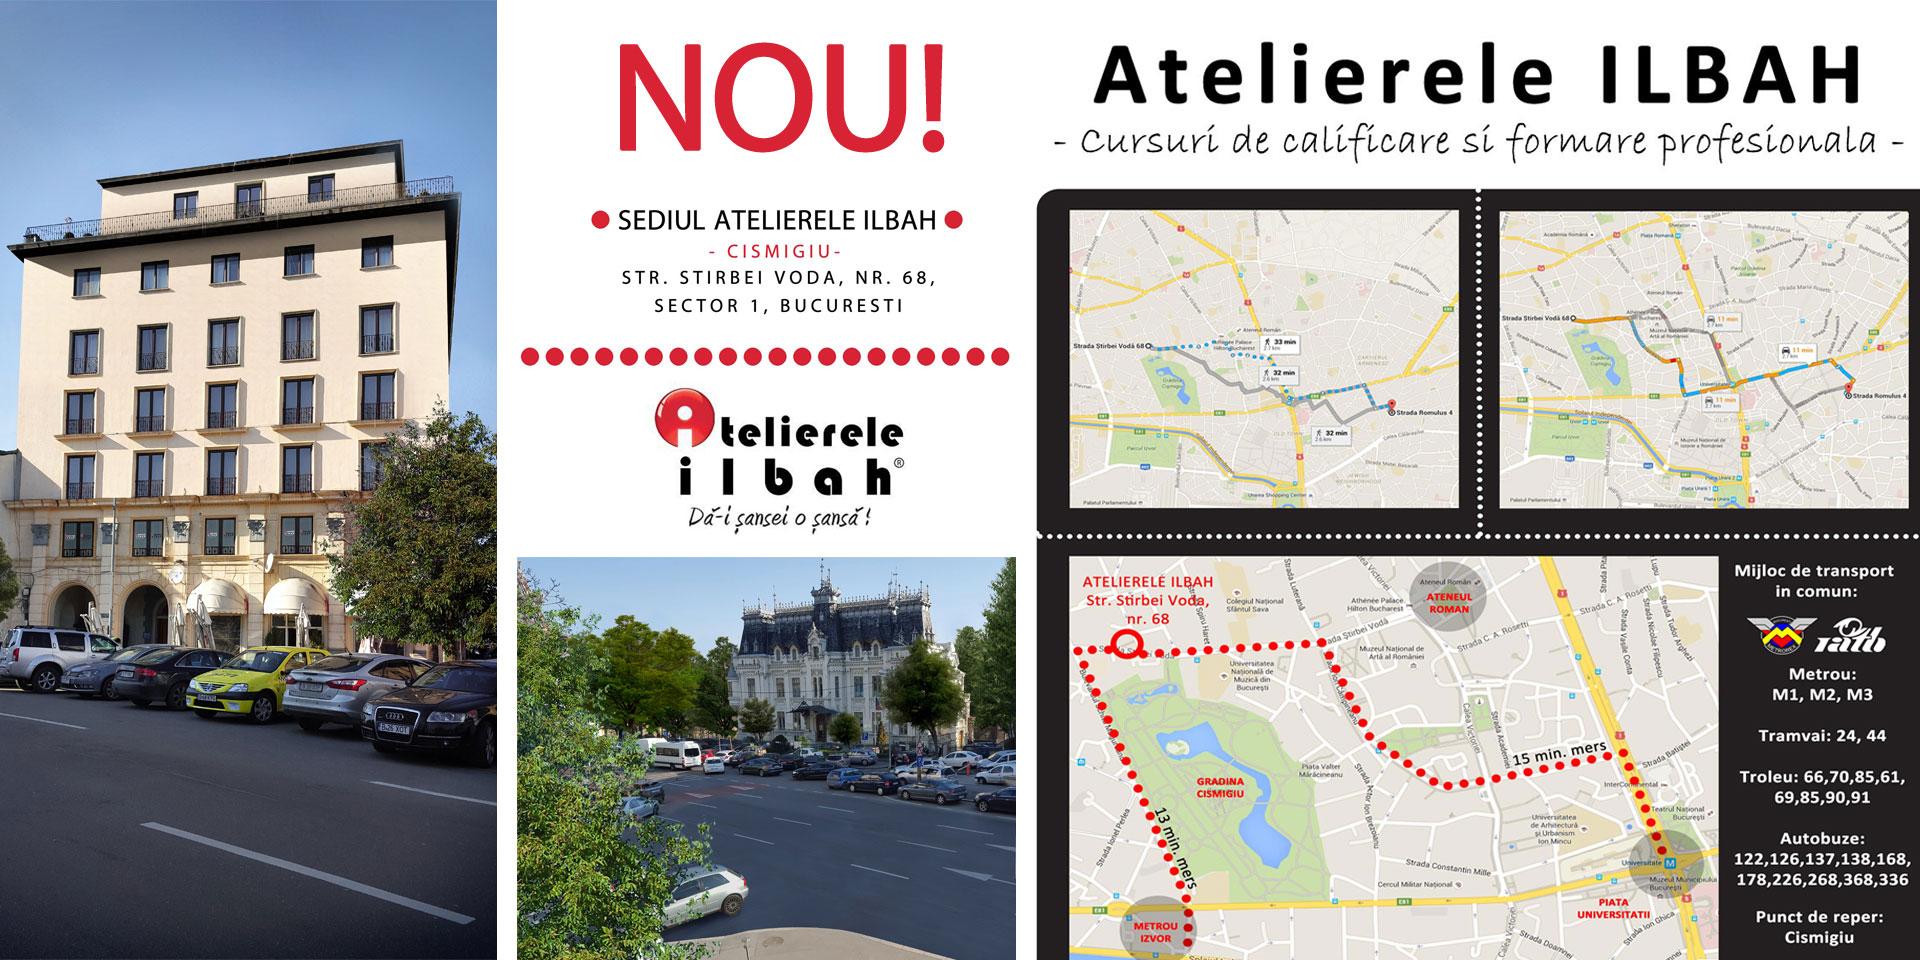 Sediul-Atelierele-ILBAH-Cismigiu-Strada-Stirbei-Voda-numarul-68-etaj-1-apartament-1-blog-poza-mare